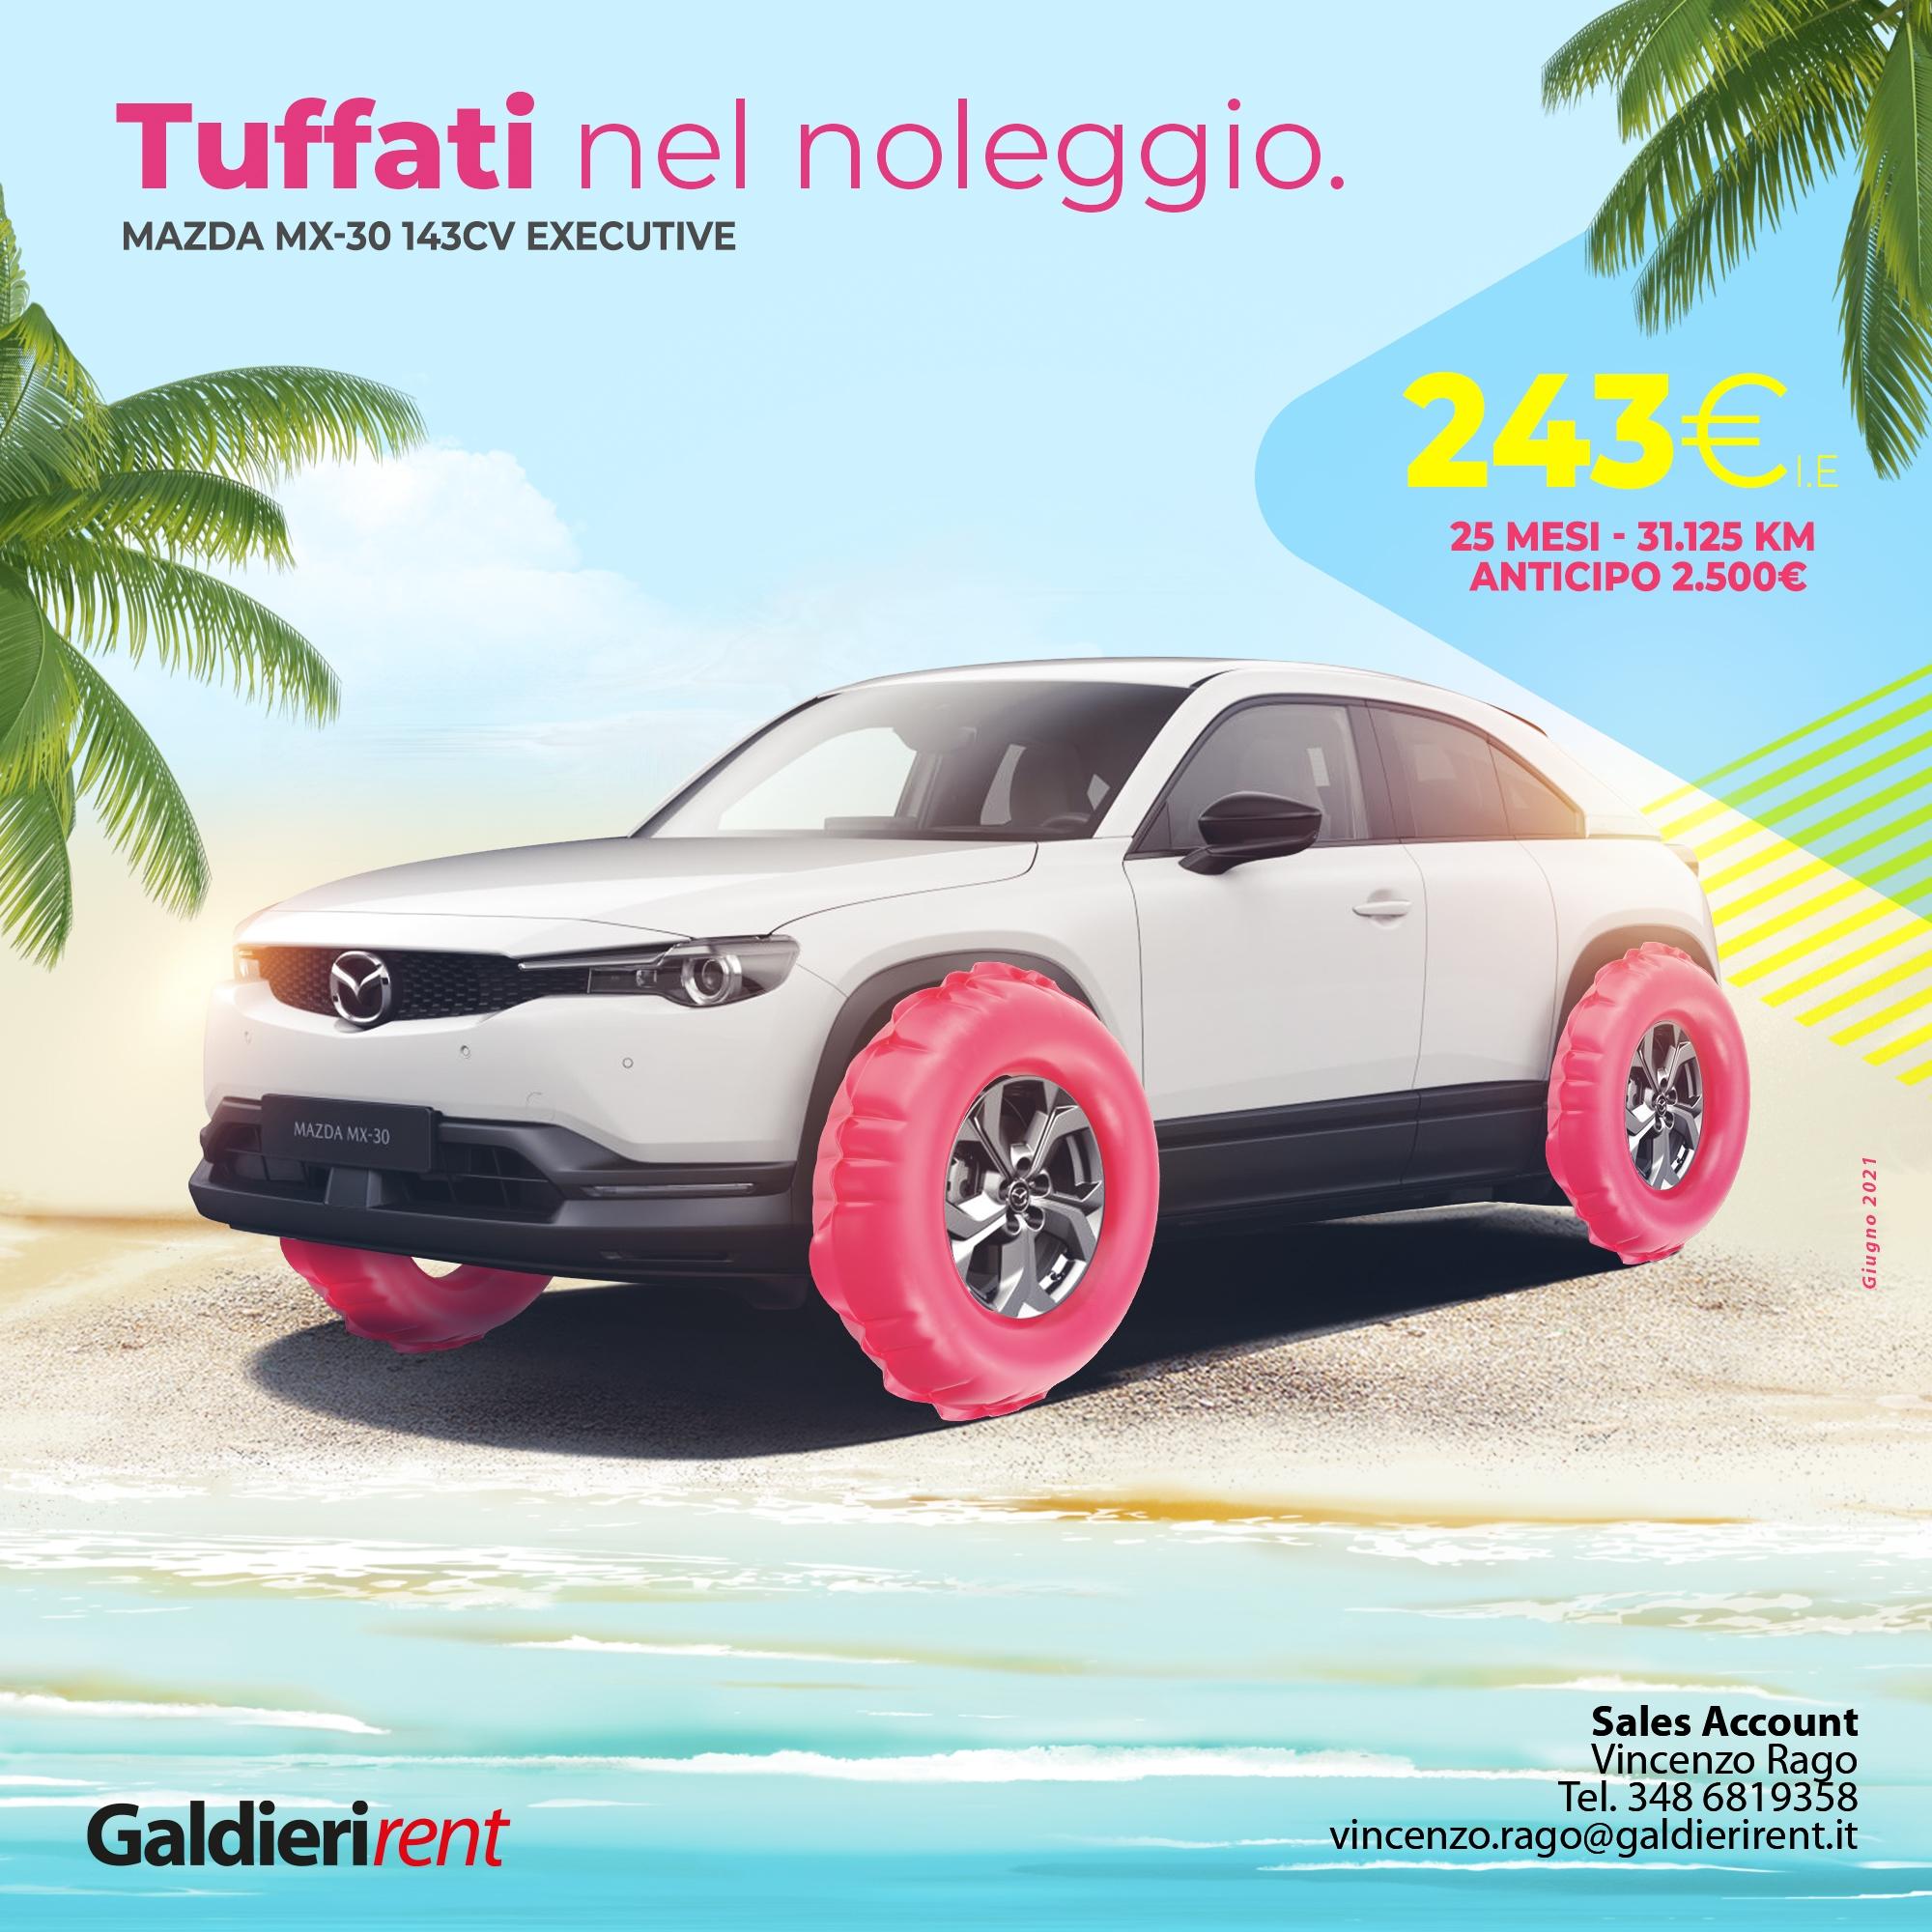 Vincenzo-Rago_06_Mazda_20210622